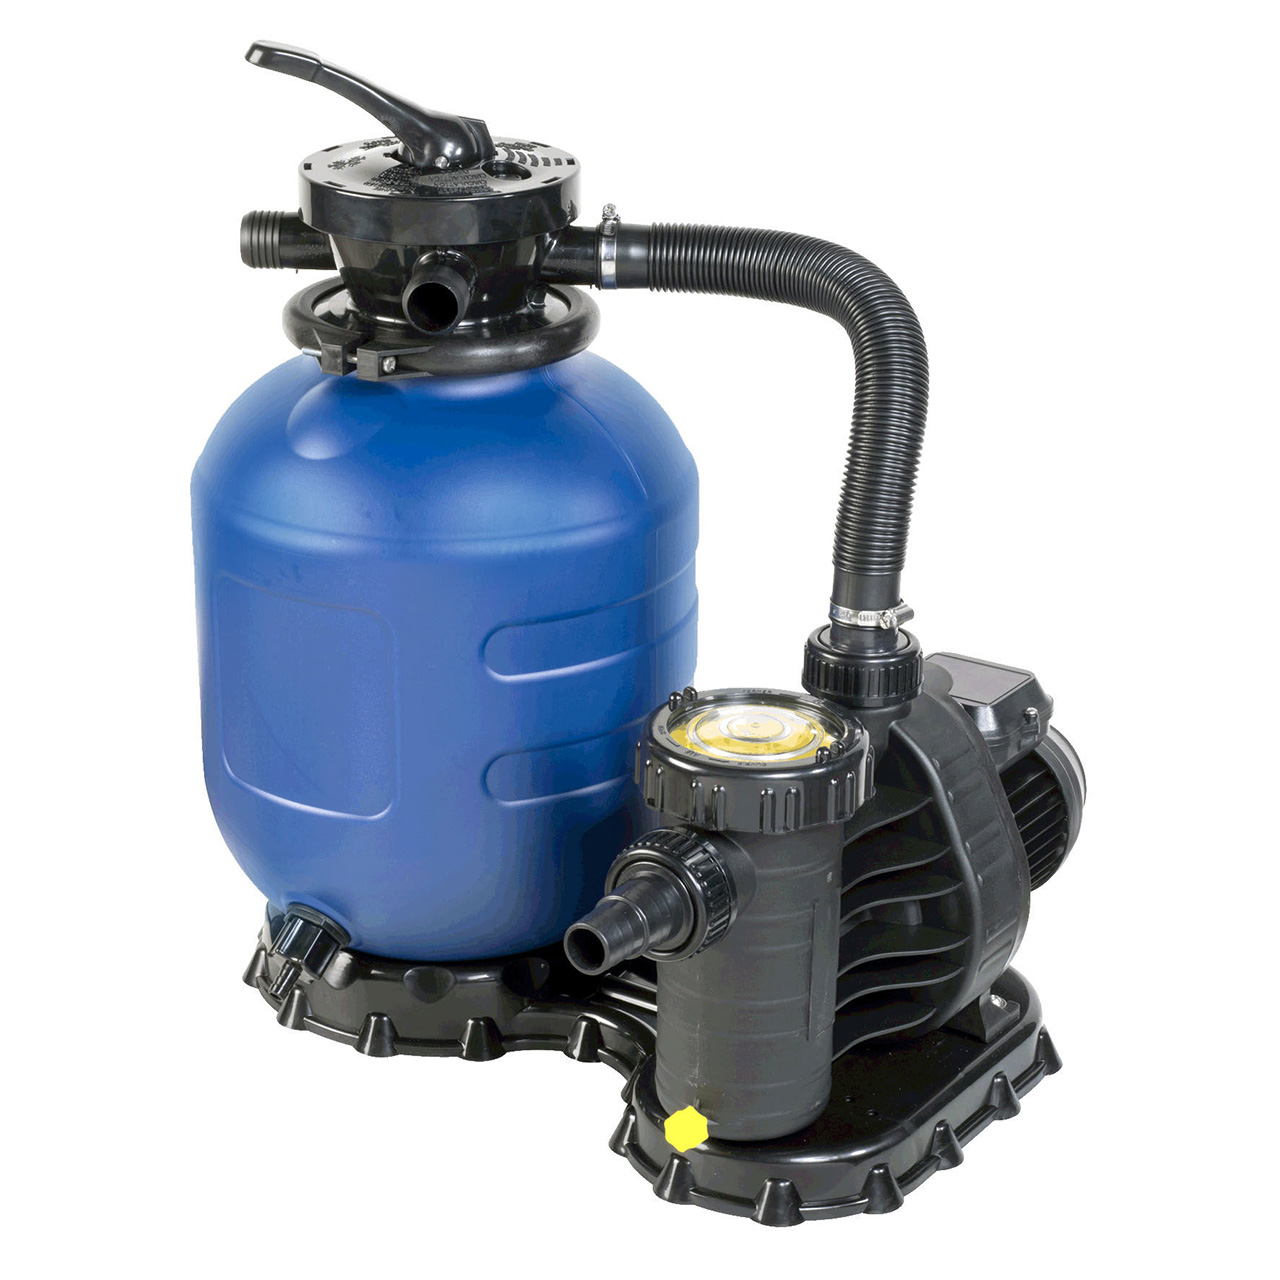 Filteranlage mit aquaplus pumpe primepool - Pool rechteckig mit pumpe ...